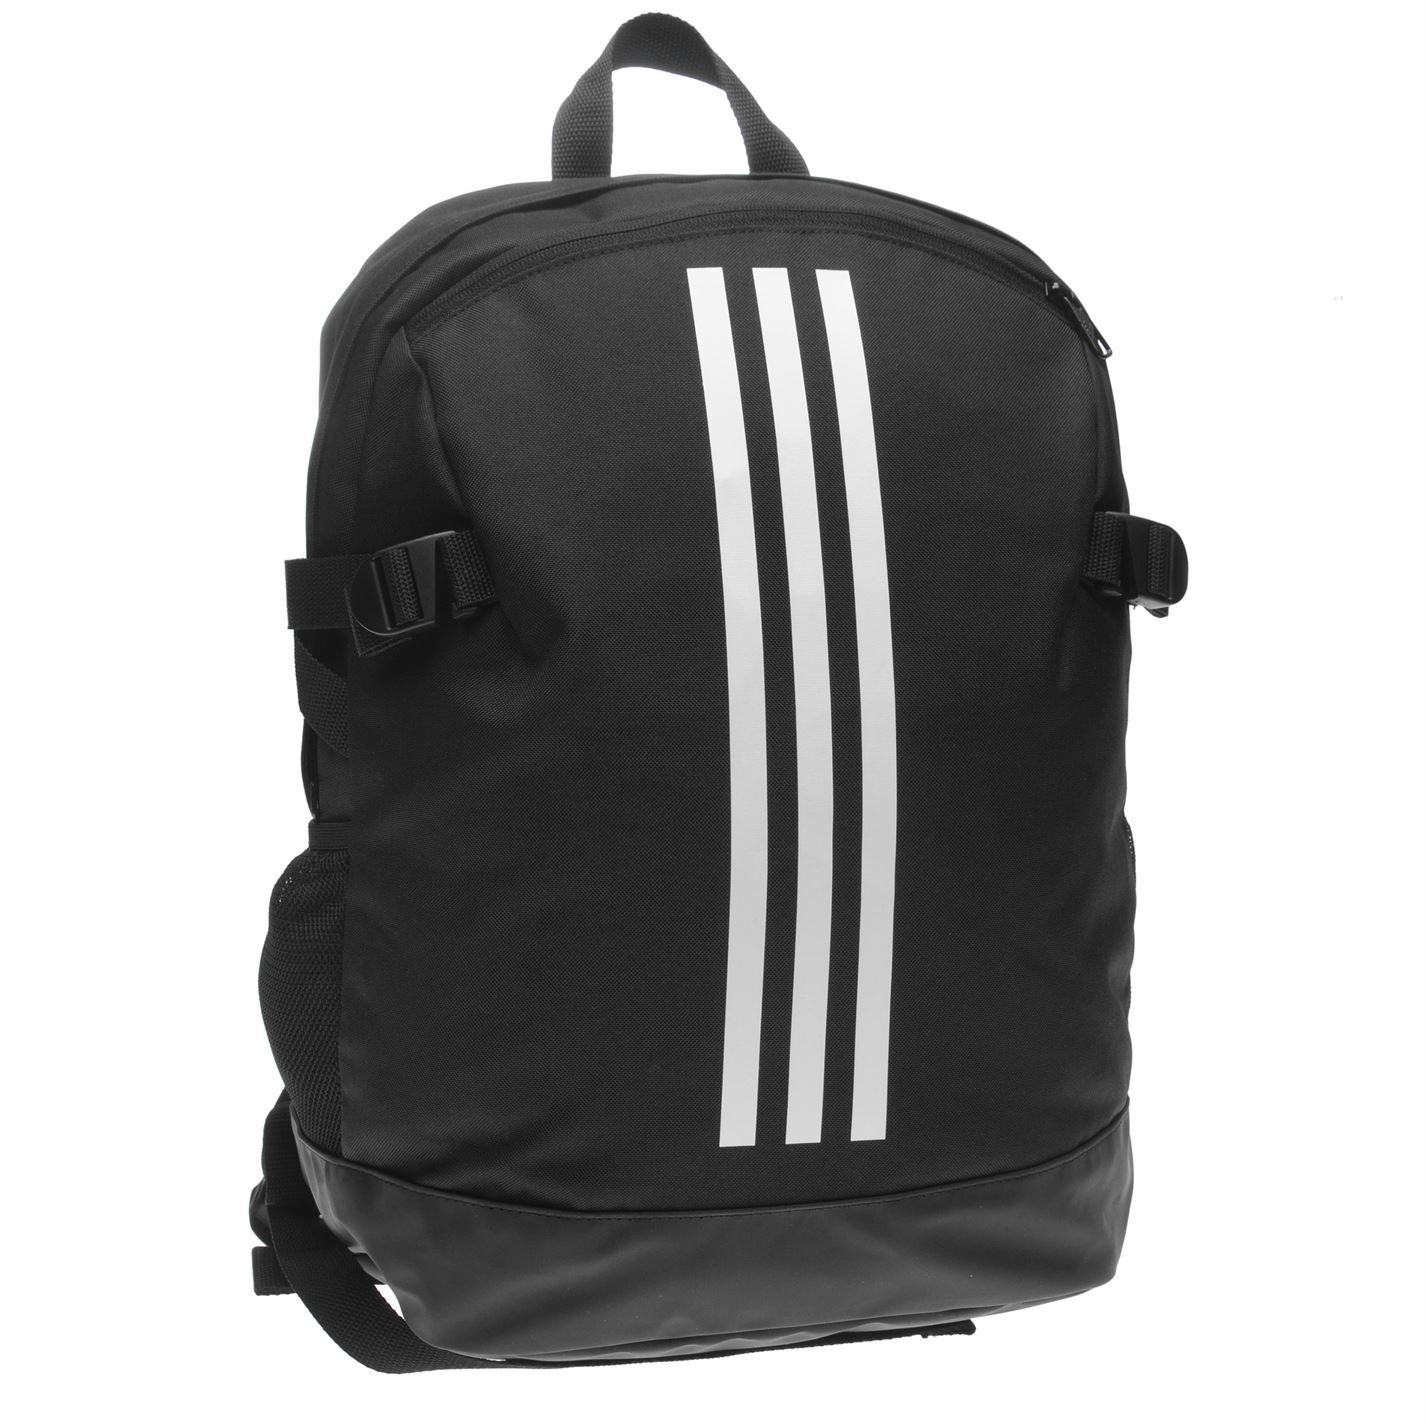 64b31babe116 ... adidas Power 4 Backpack Black White Sports Bag Holdall Rucksack ...